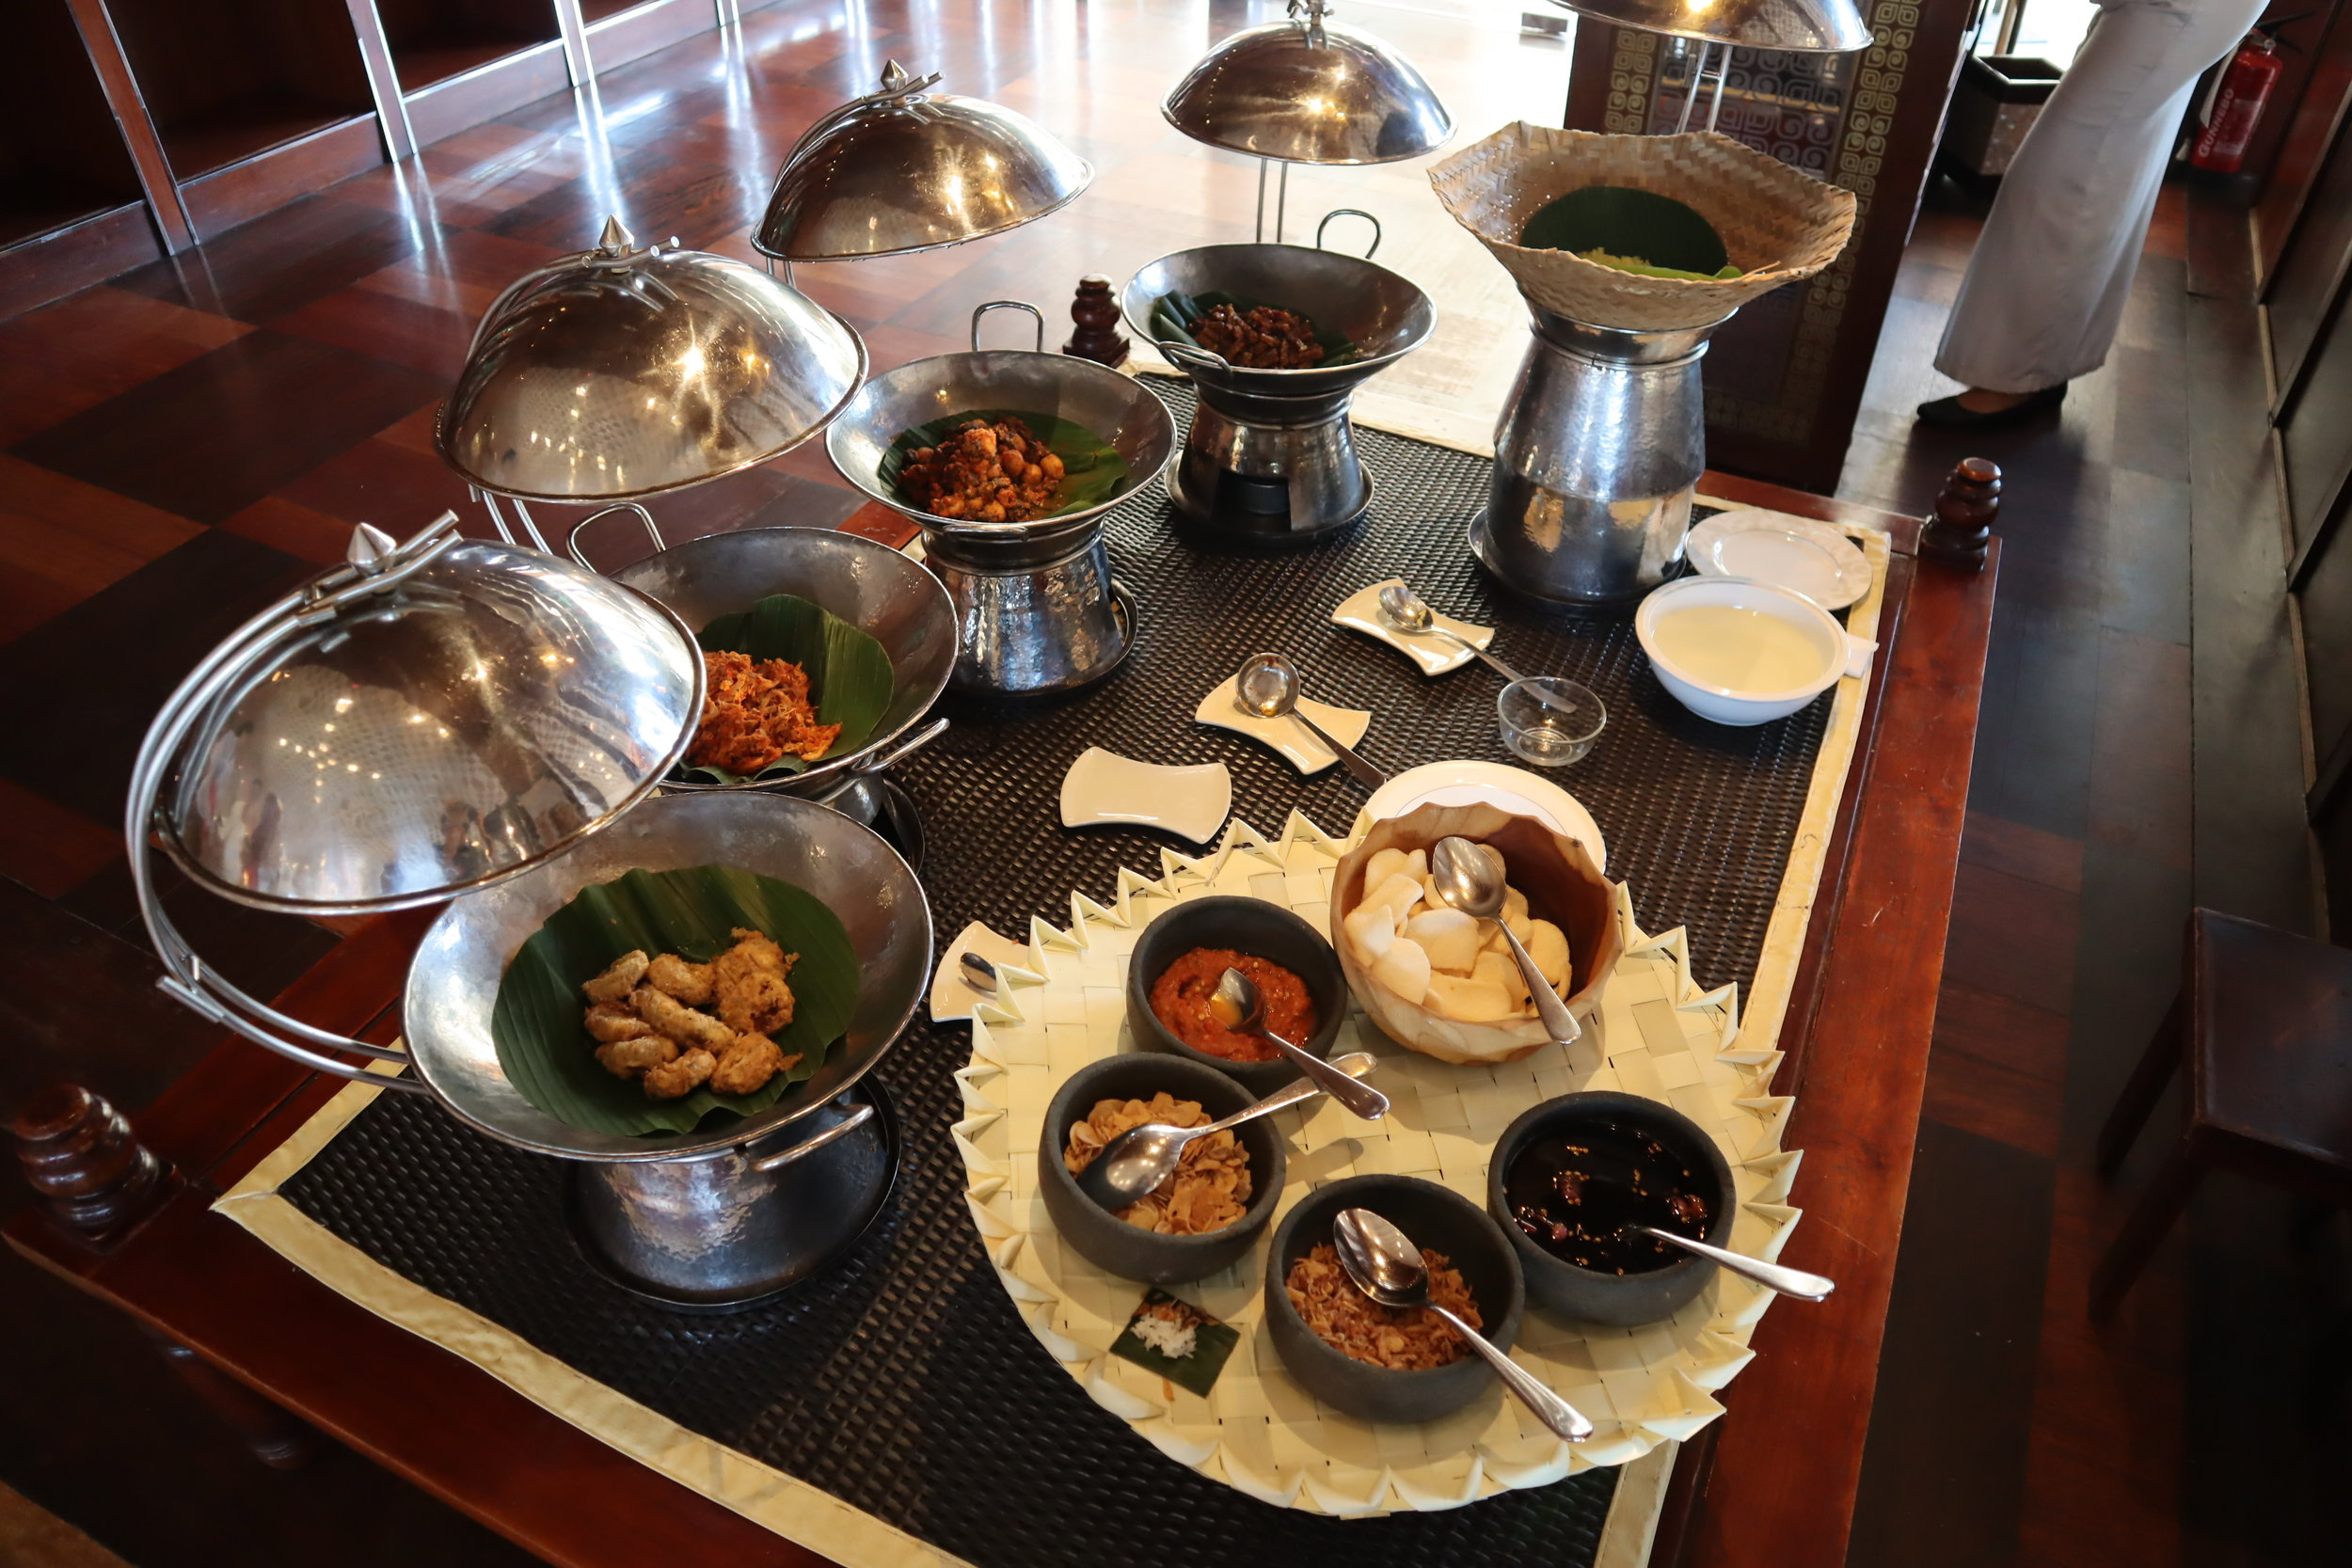 St. Regis Bali – Traditional Indonesian spread